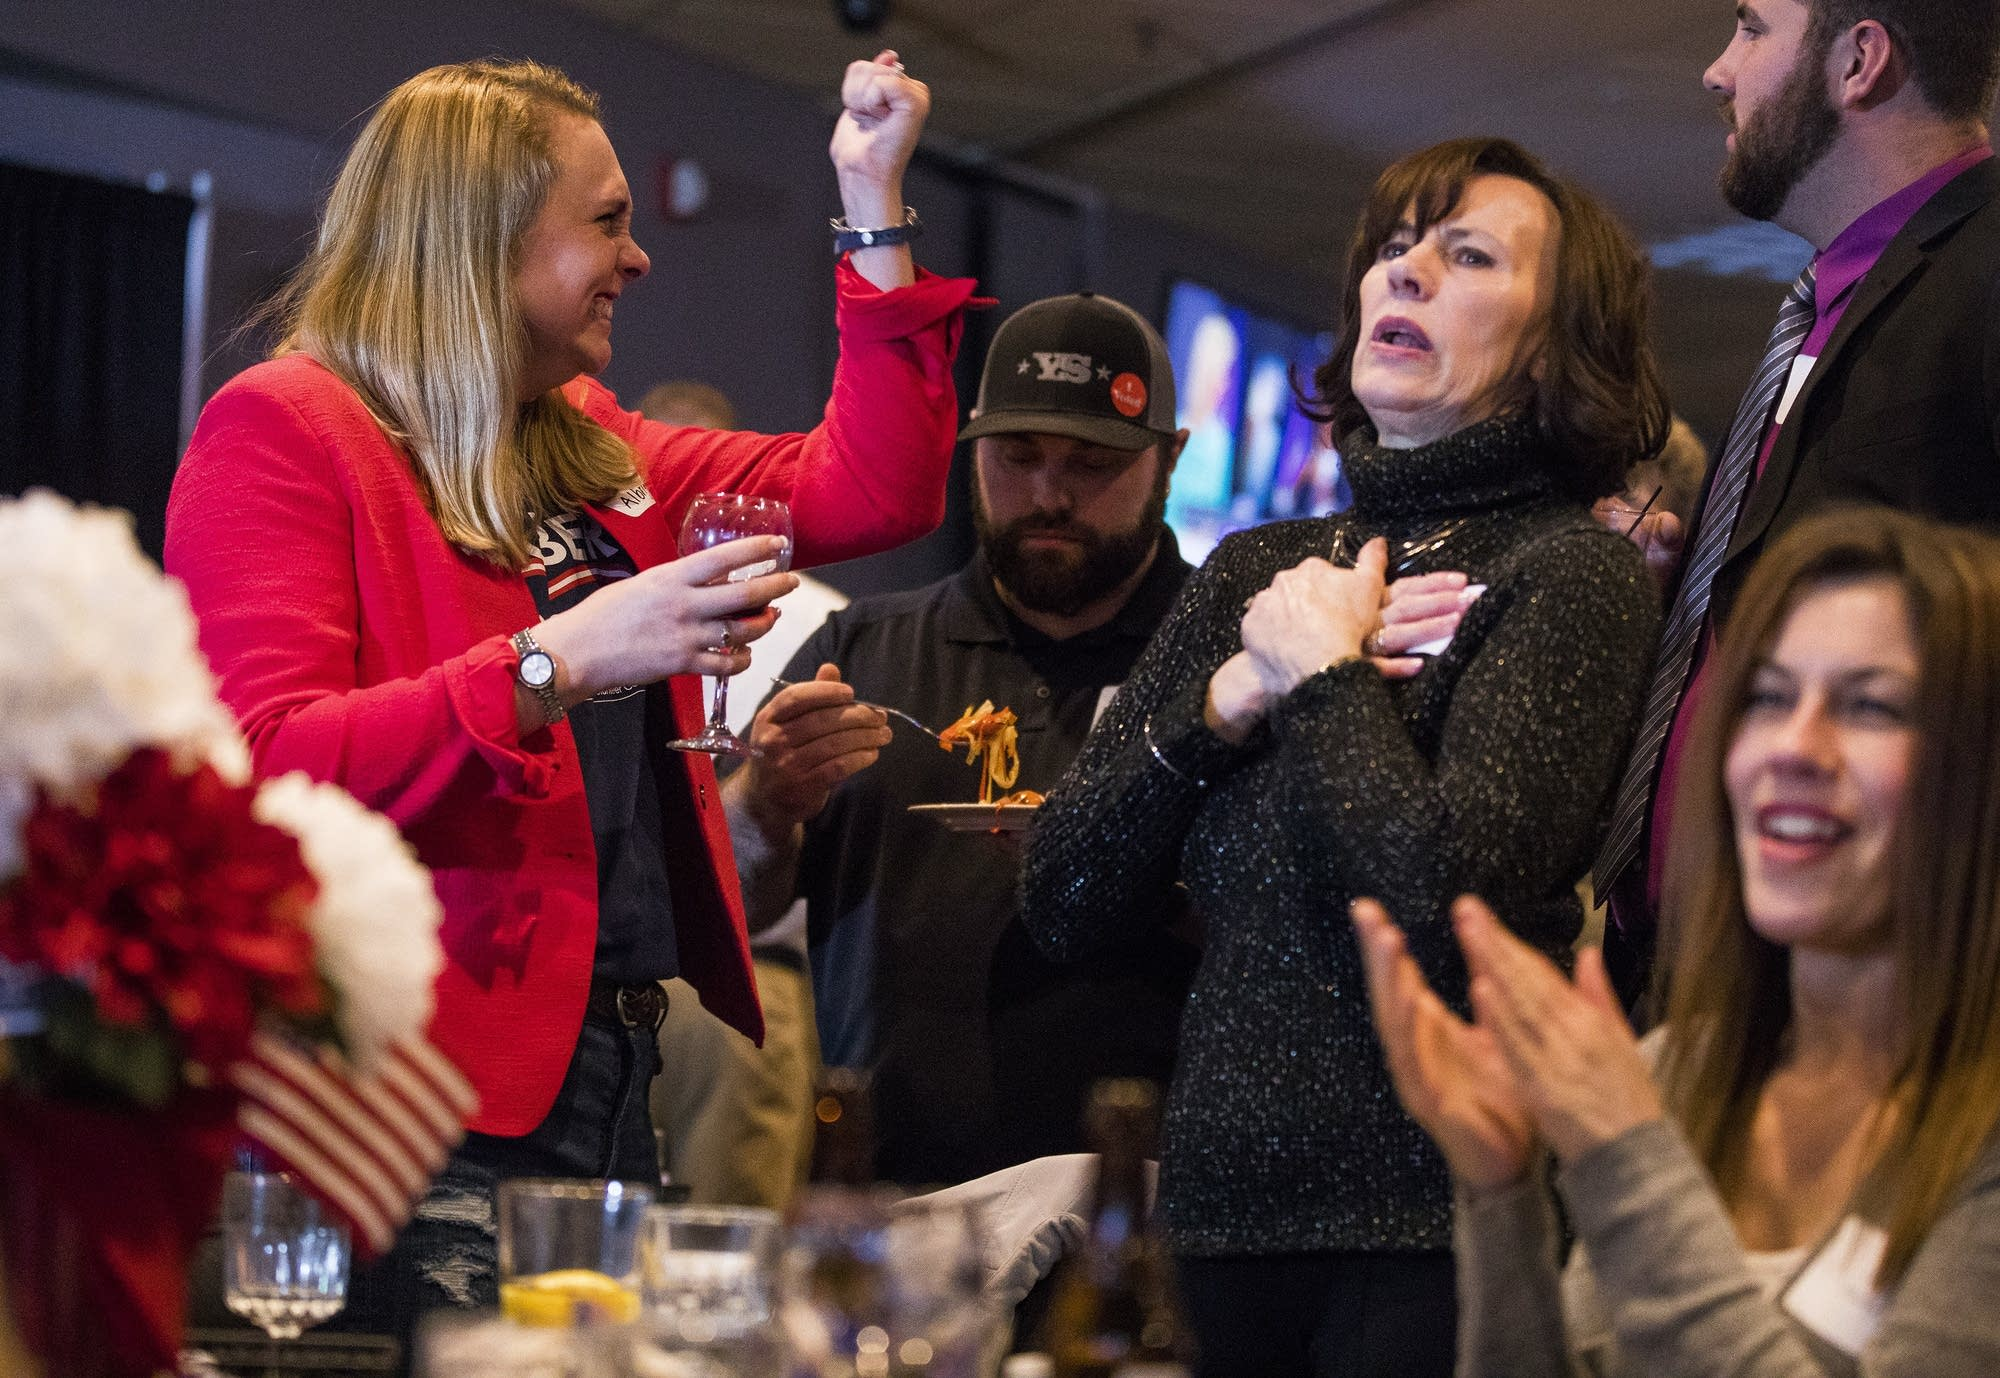 Stauber supporters celebrate.